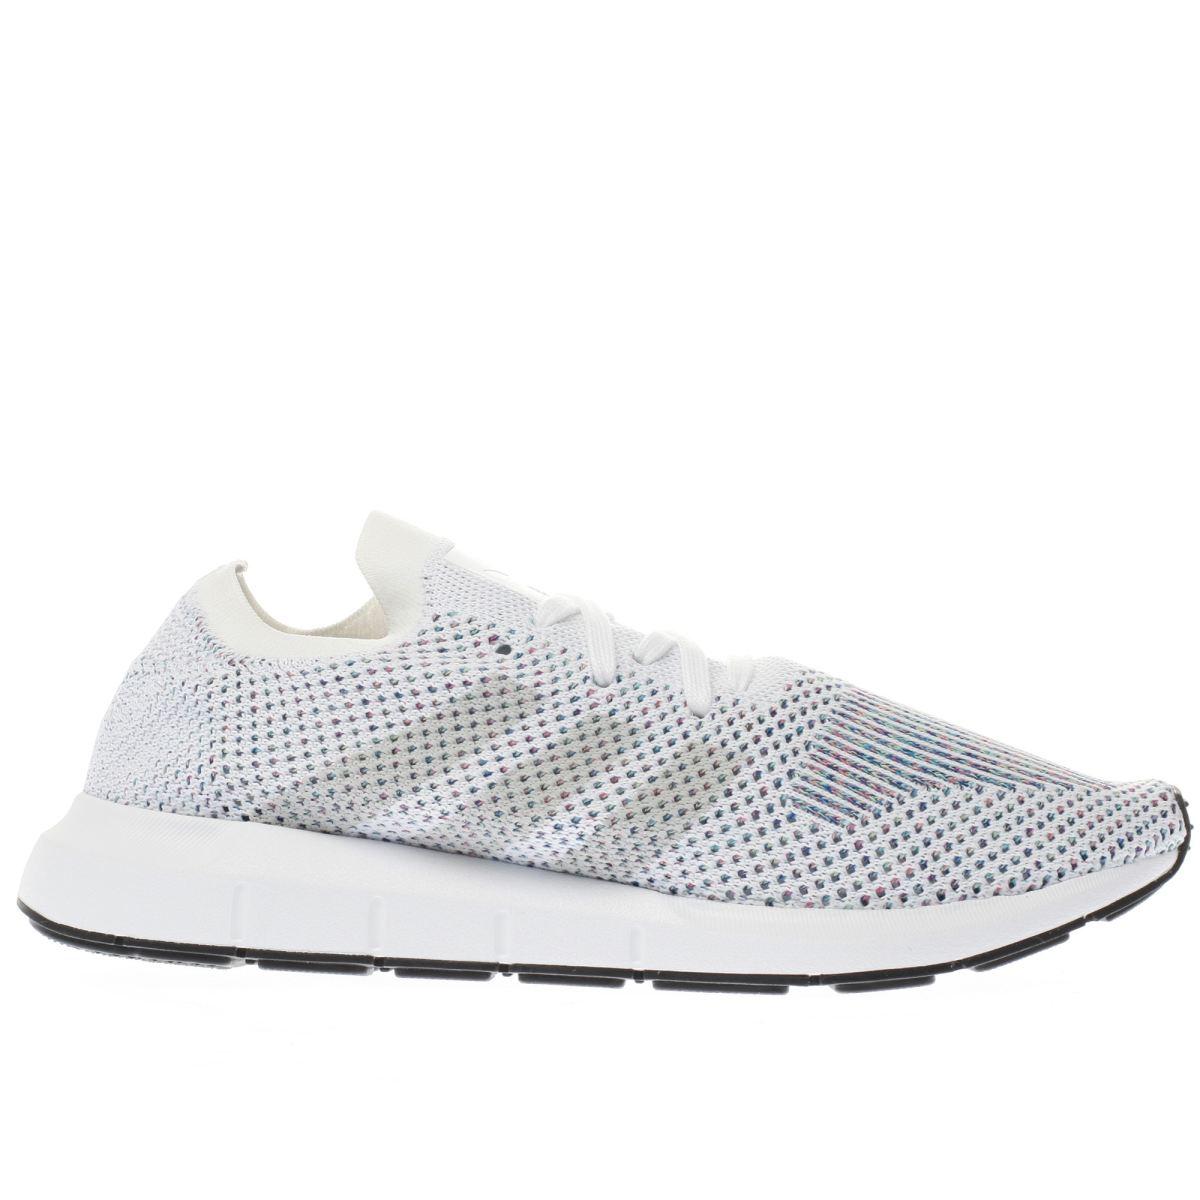 adidas white swift run primeknit trainers